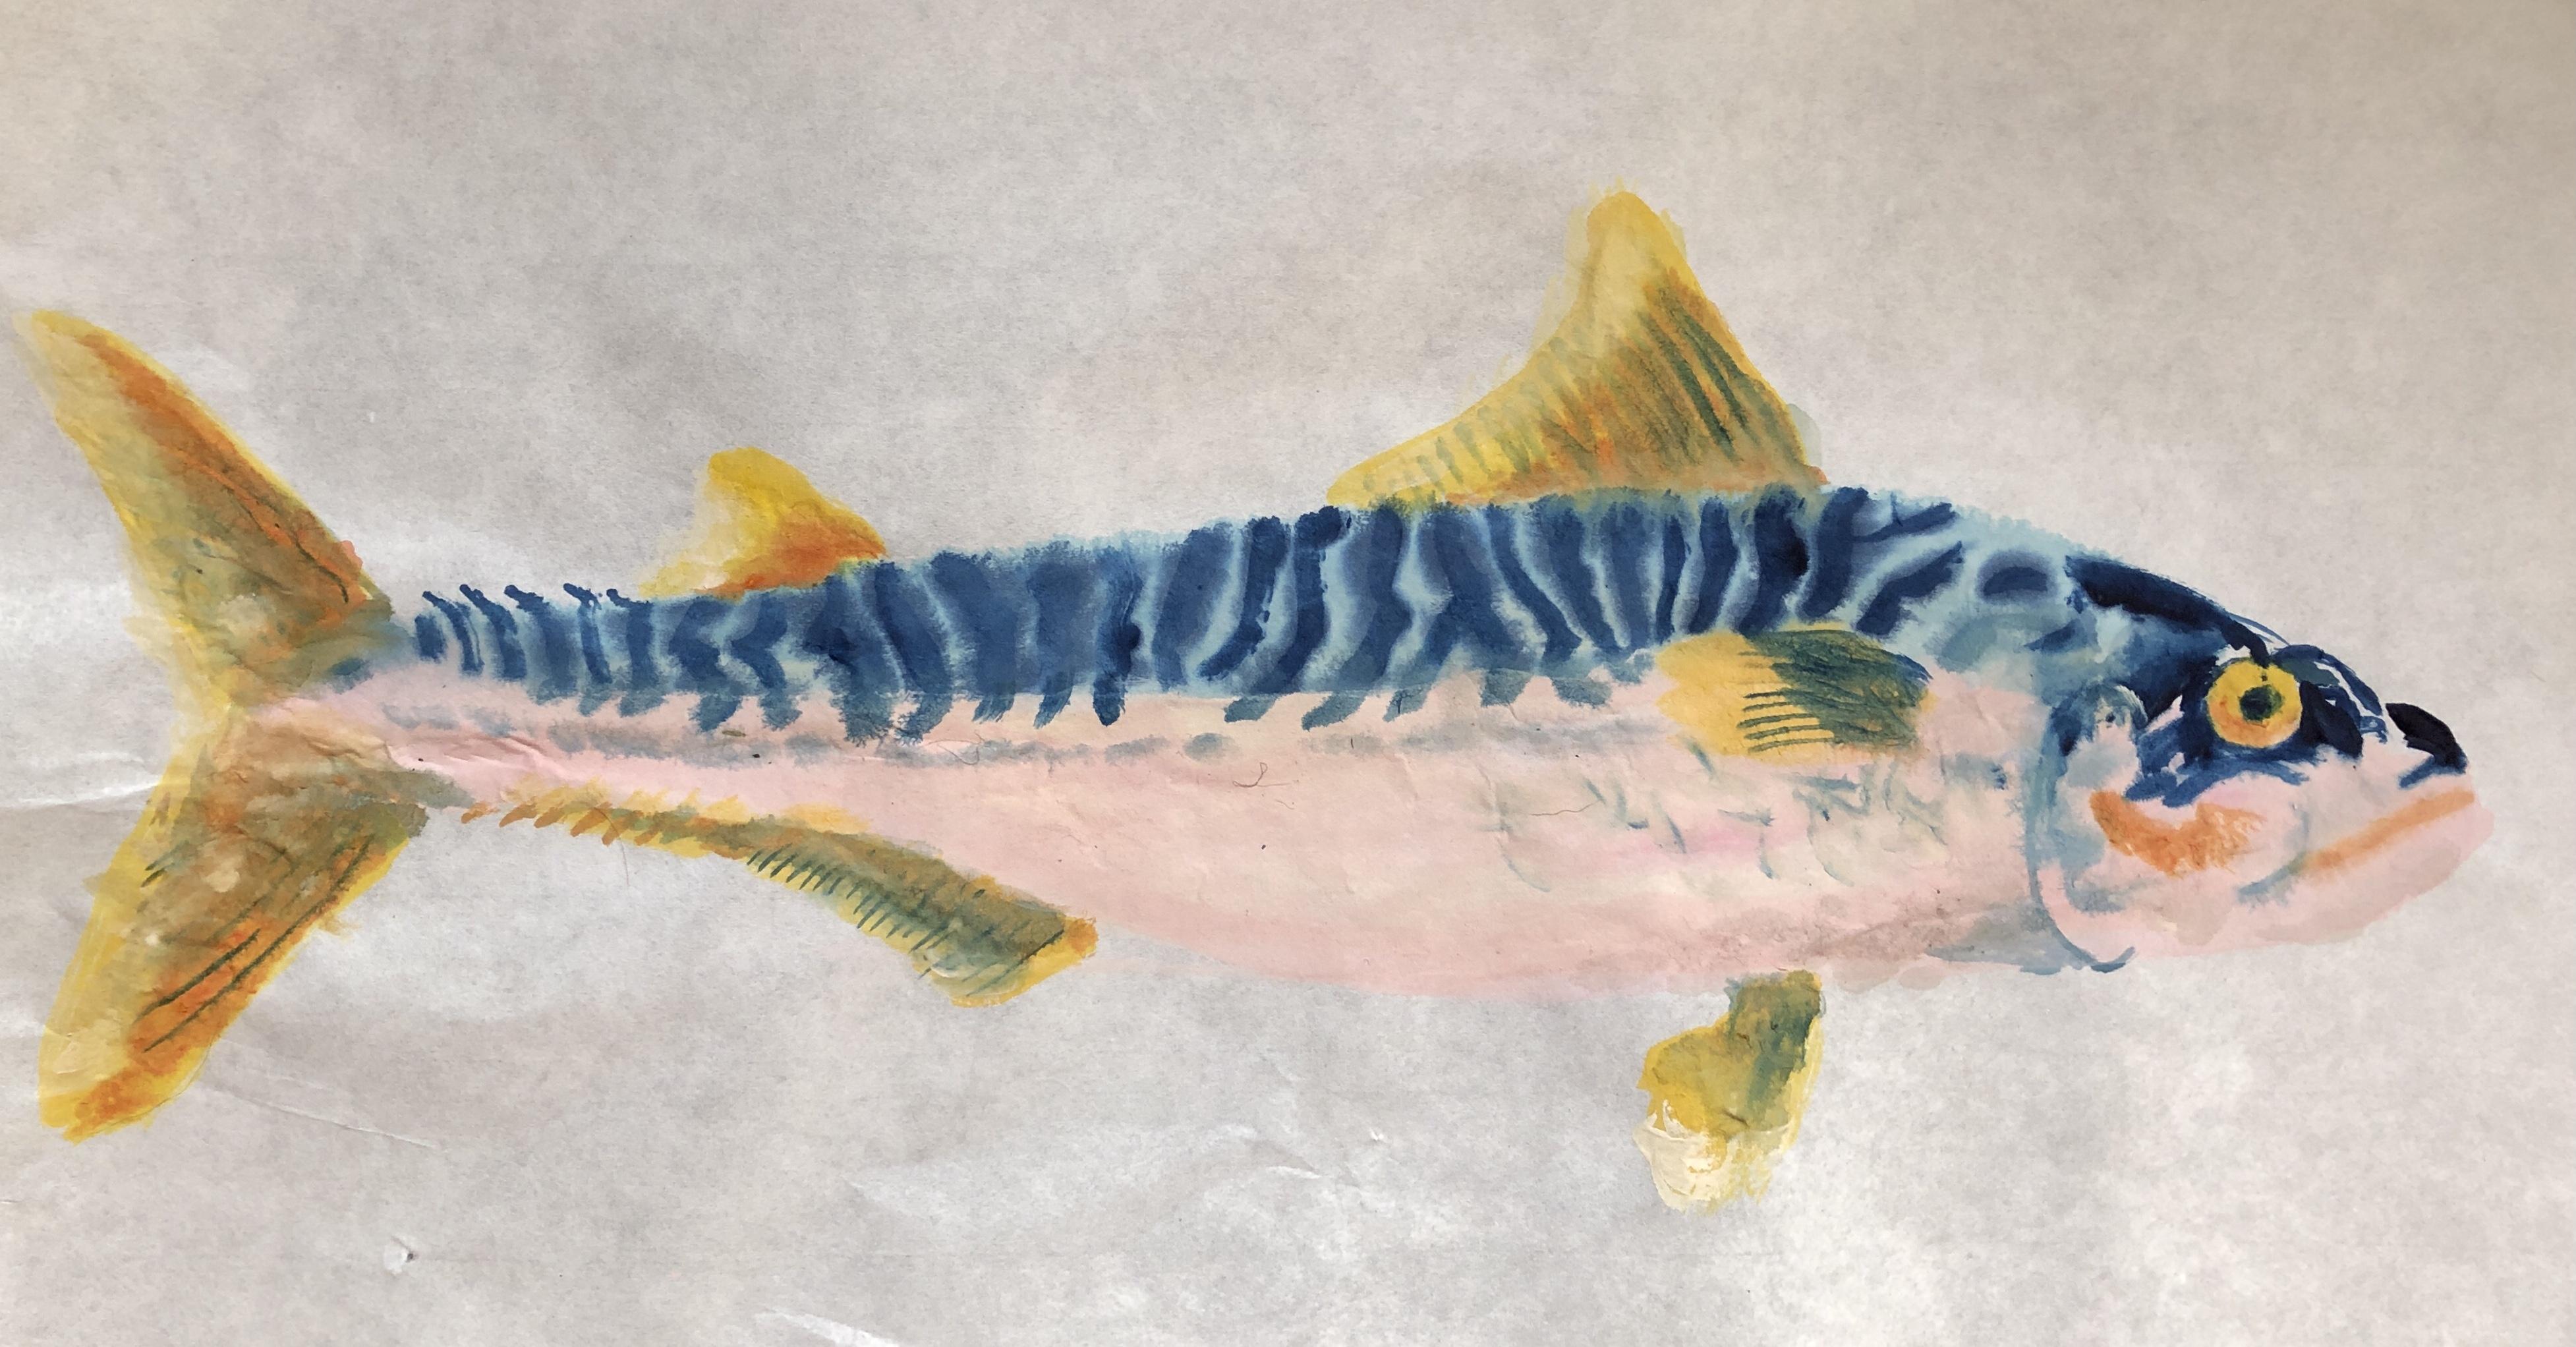 Mackerel, 2021, Tinte, Gouache, Acryl auf Japanpapier, 28 x 53 cm